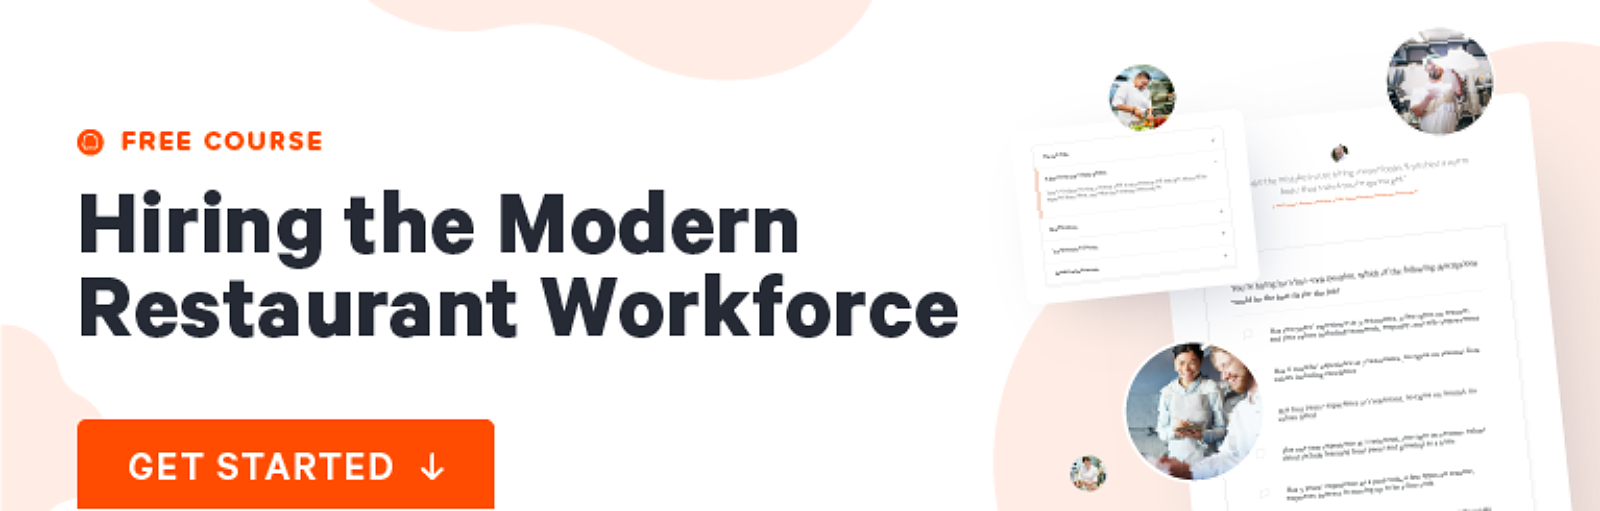 Modern-workforce-course_blog-form-cta-1